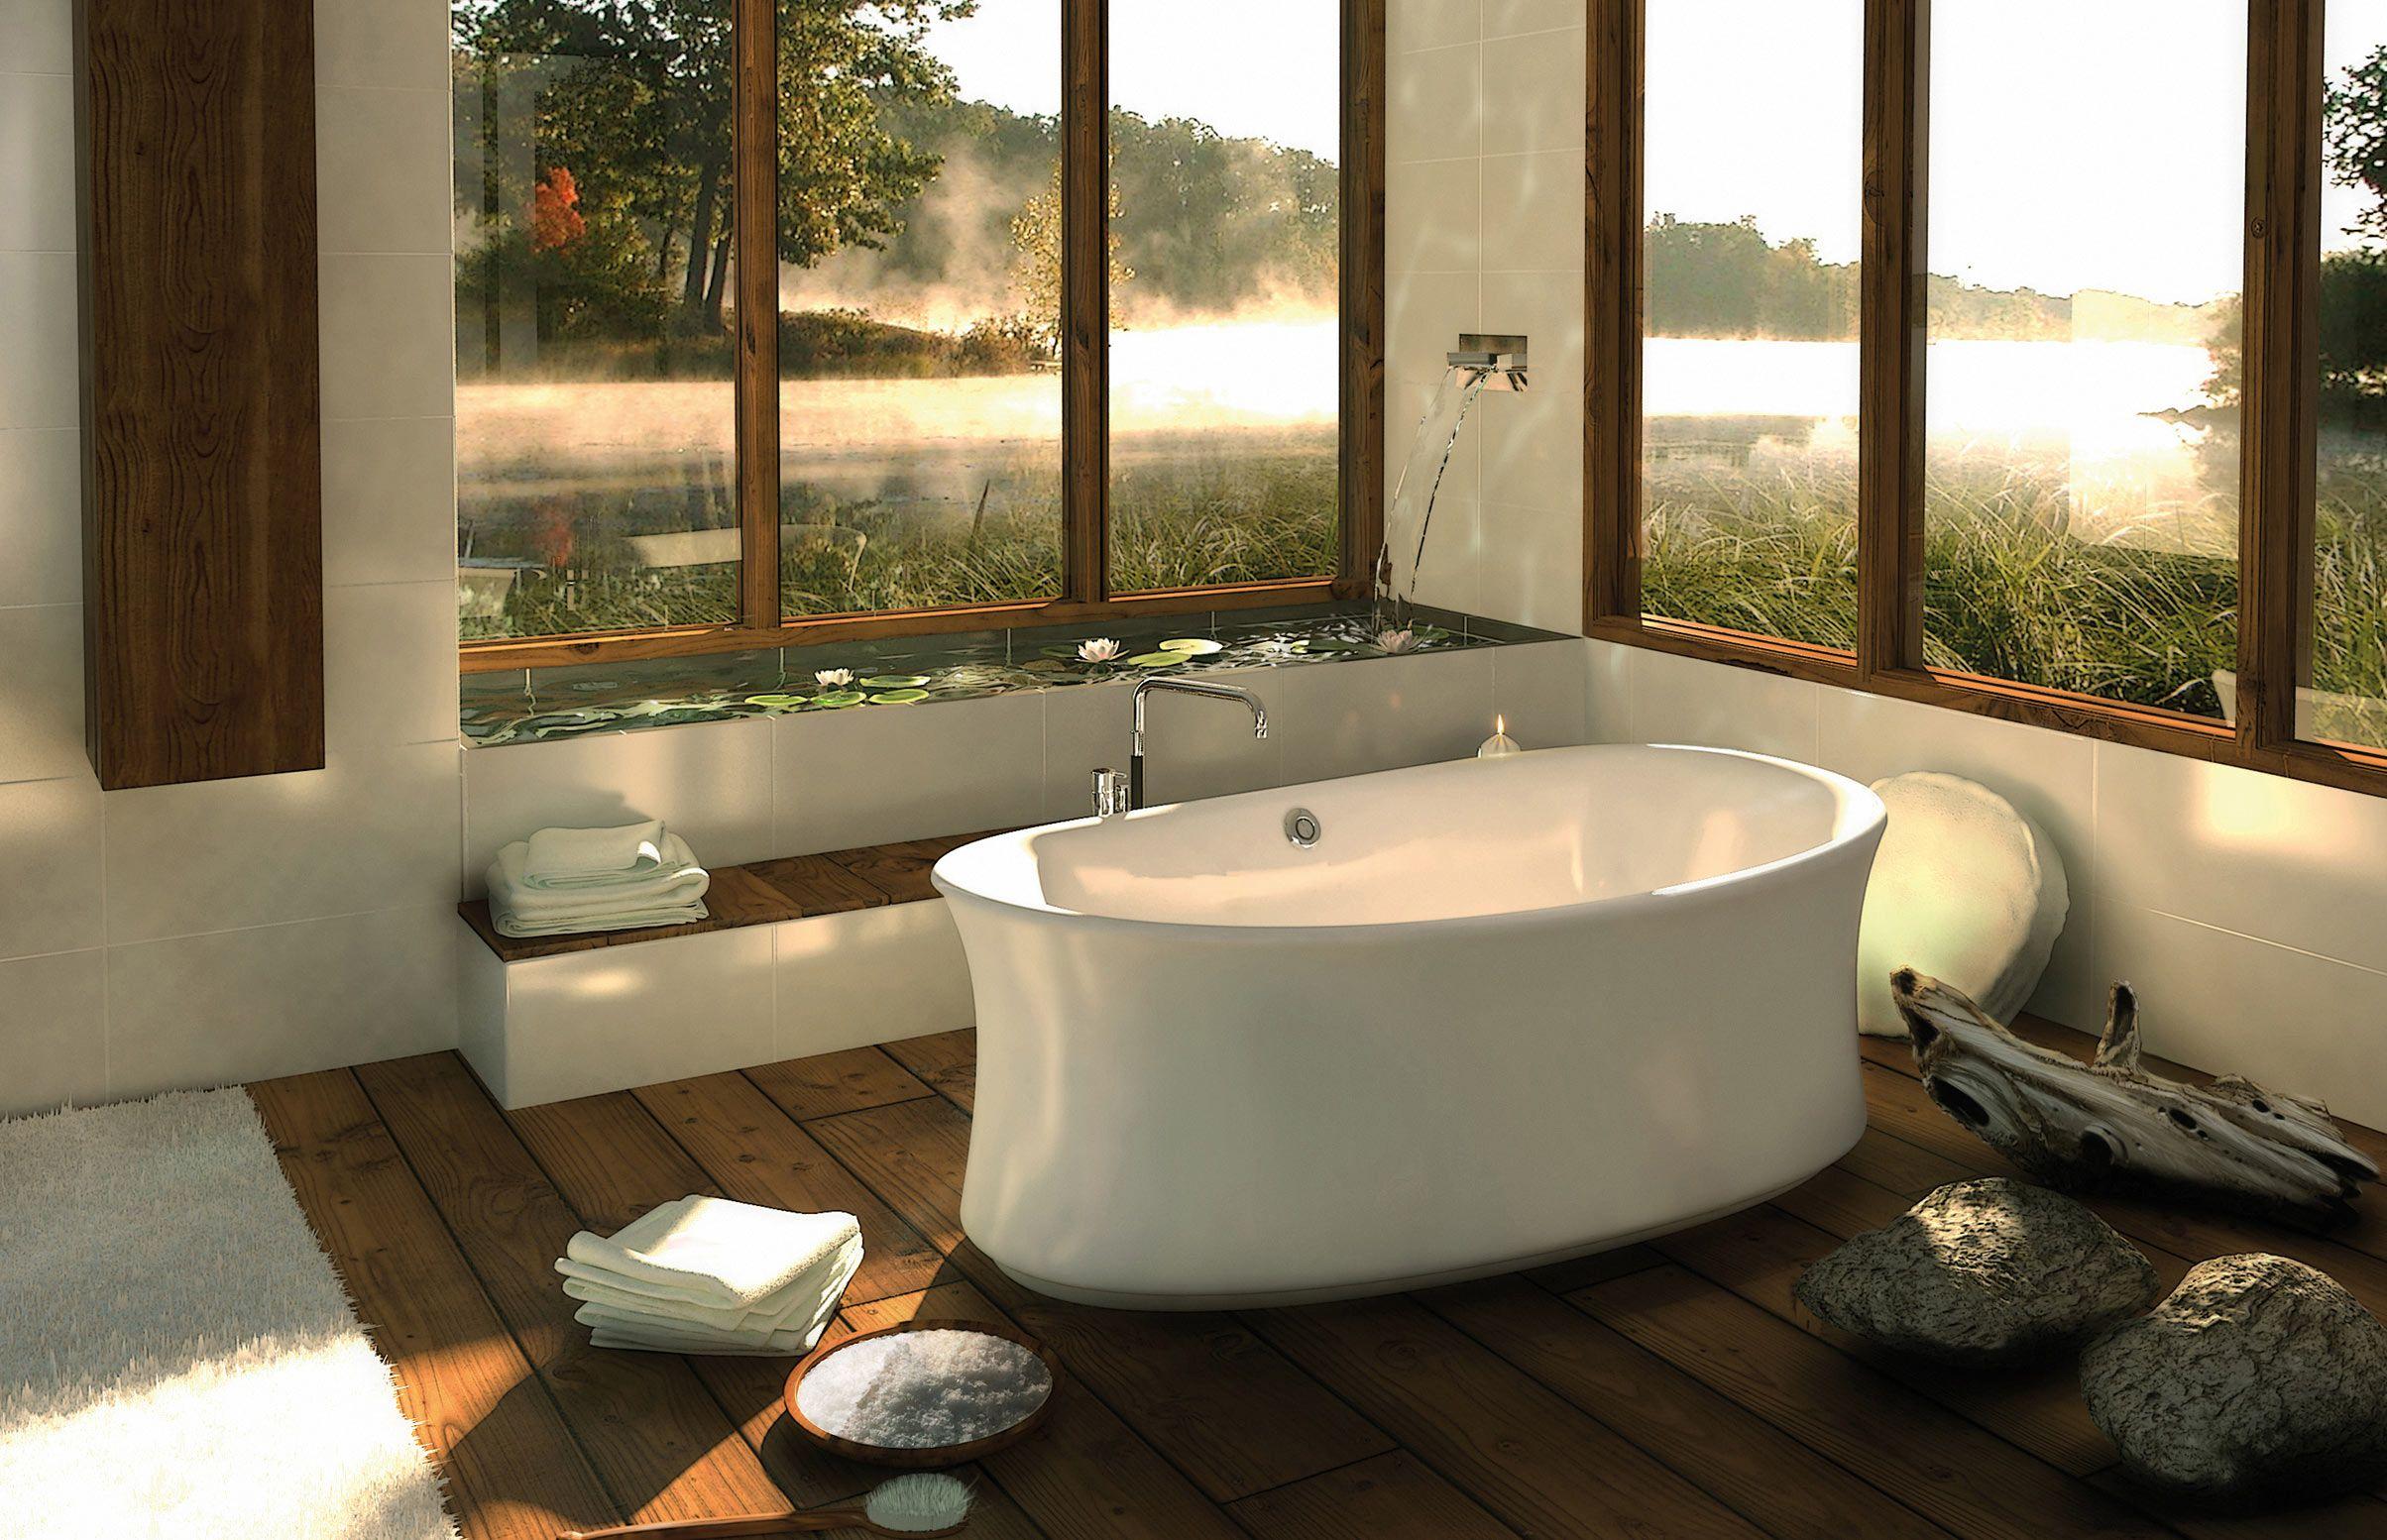 AMBROSIA F Freestanding bathtub - MAAX Collection | Bathroom Designs ...